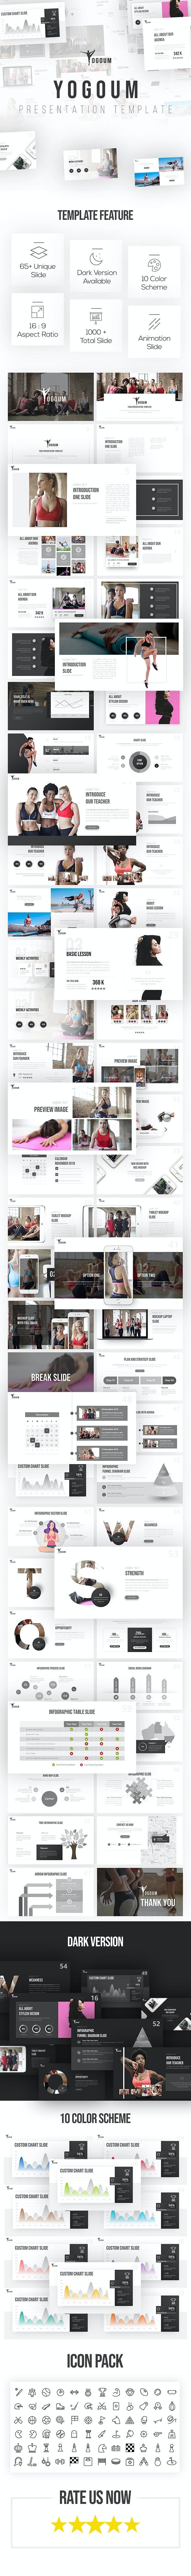 Yogoum - Yoga & GYM PowerPoint Template - PowerPoint Templates Presentation Templates